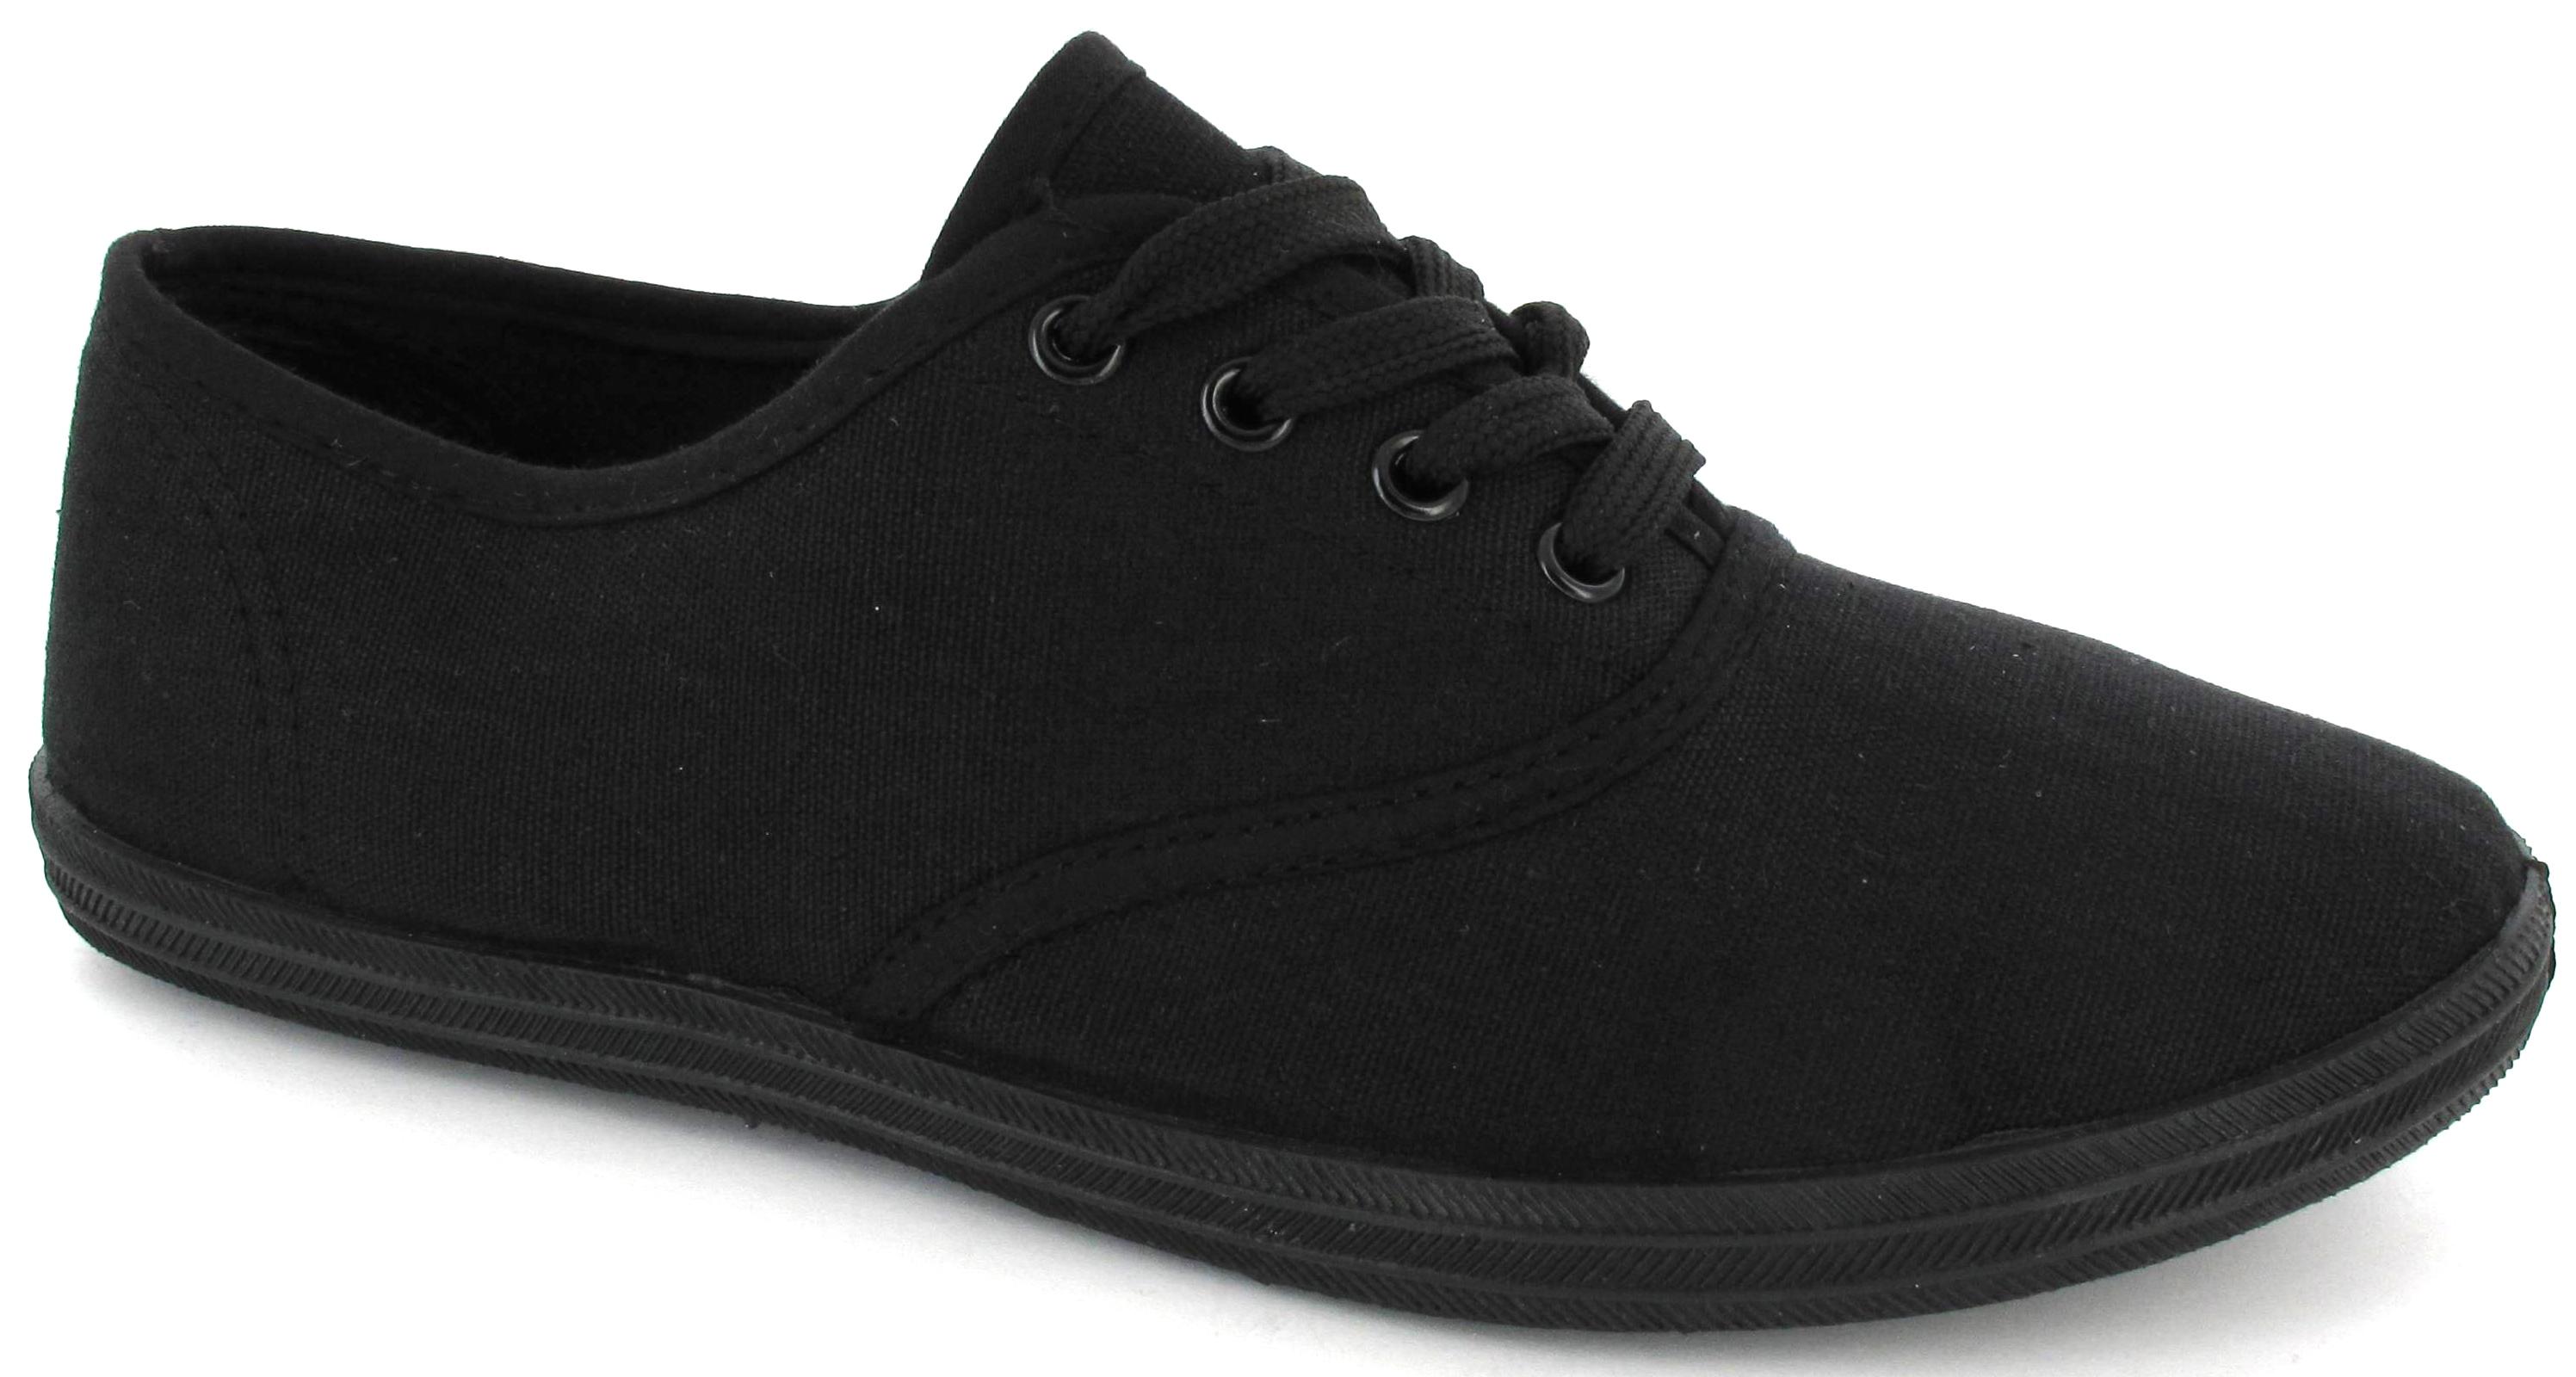 Womens Black Flat Shoes Size